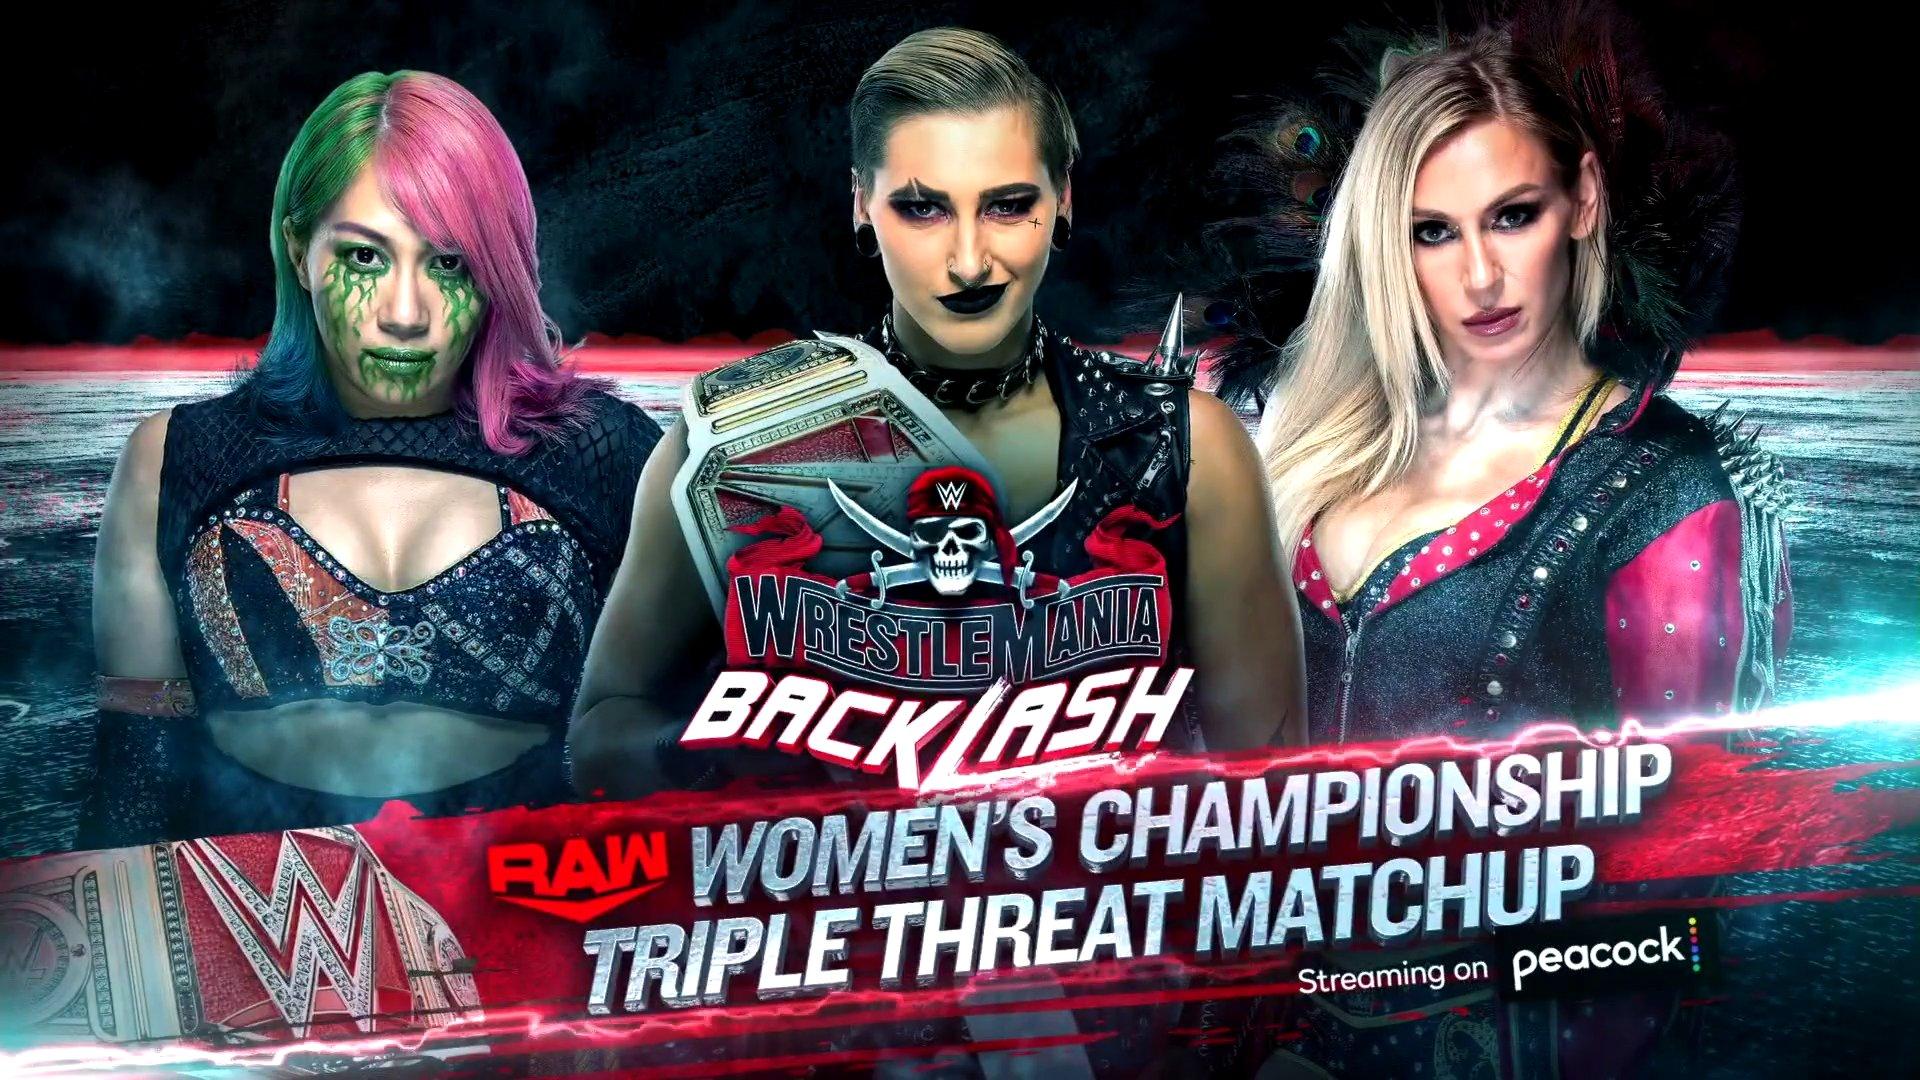 WWE Wrestlemania Backlash 2021: Spoiler On Match Outcomes 87